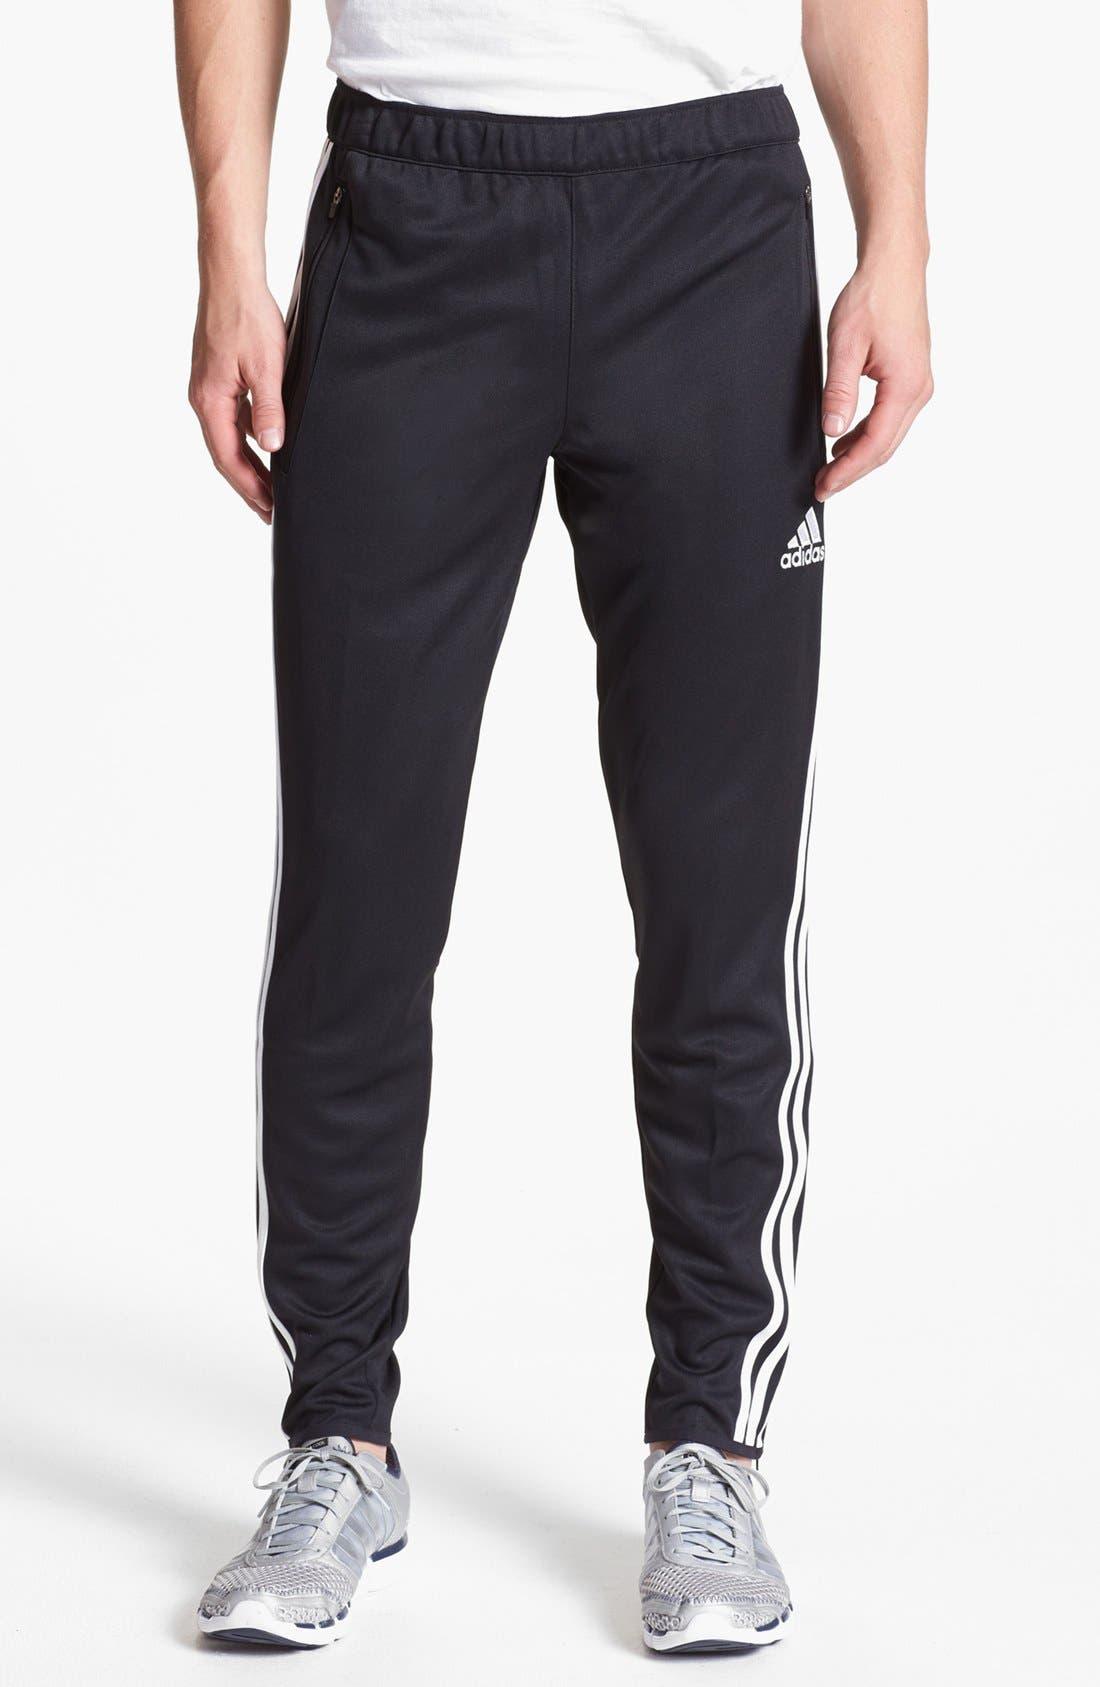 ADIDAS,                             'Tiro 13' Slim Fit Training Pants,                             Main thumbnail 1, color,                             001